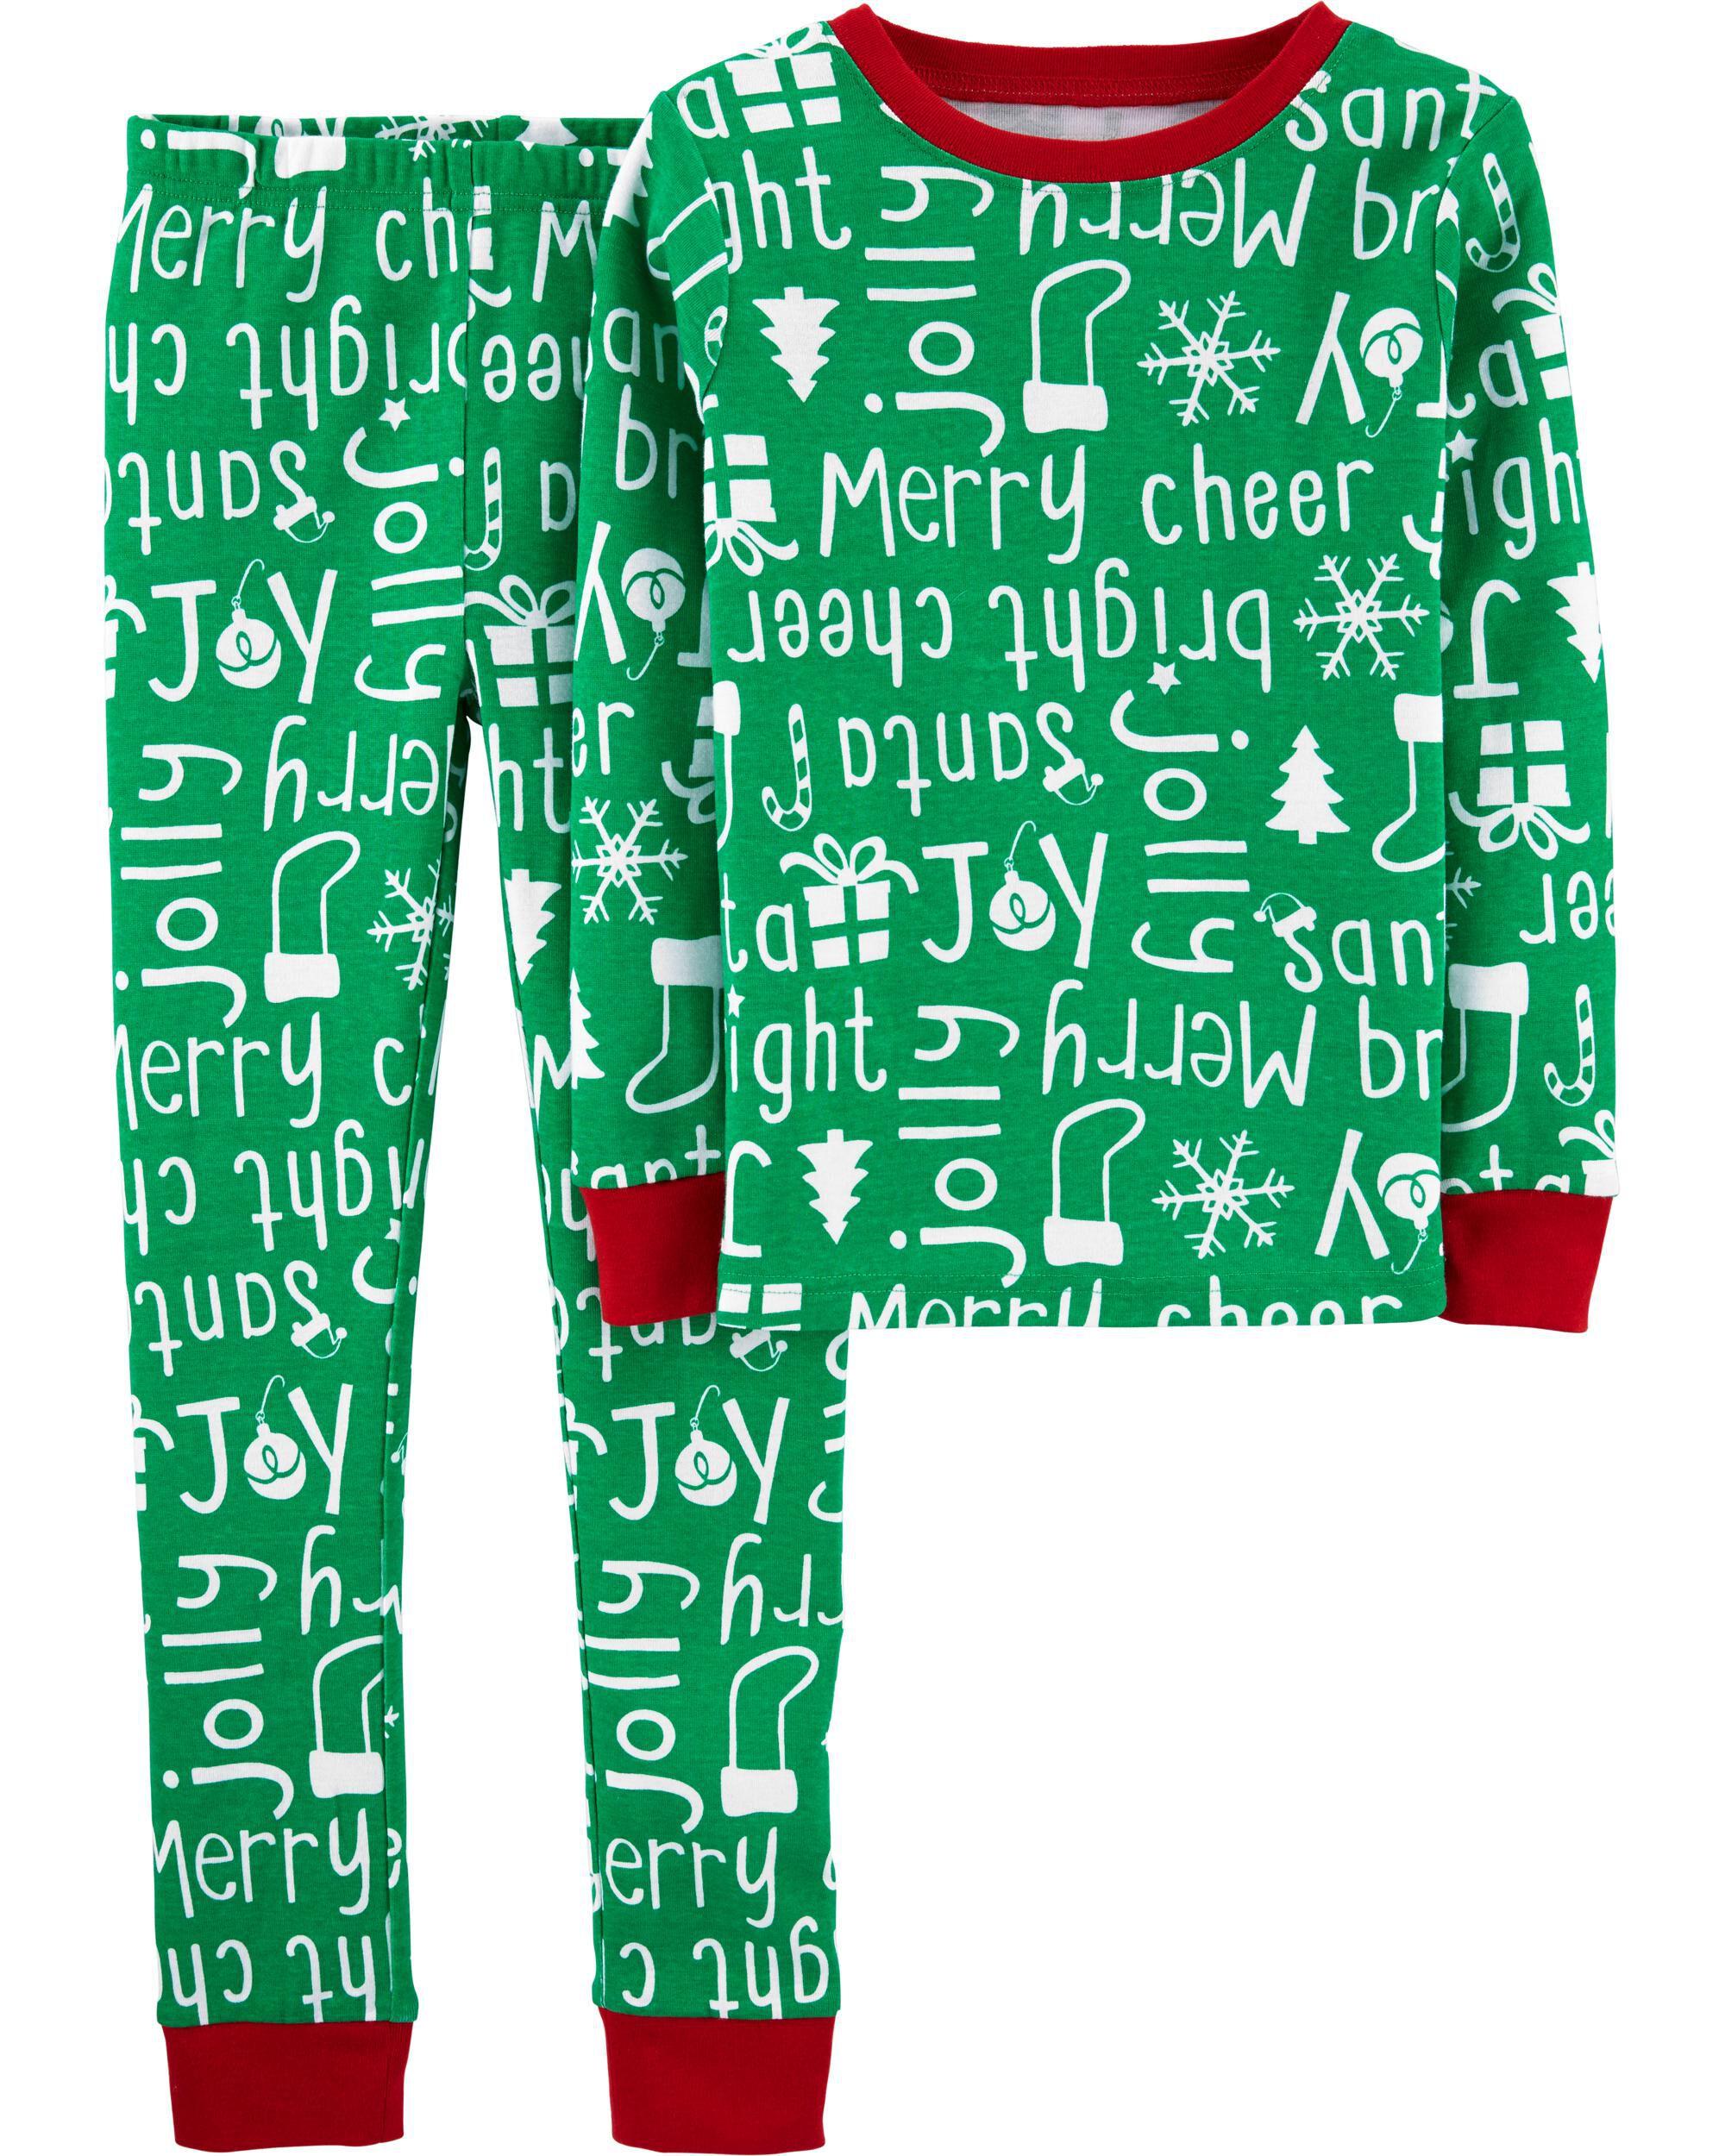 *DOORBUSTER* 2-Piece Christmas Snug Fit Cotton PJs